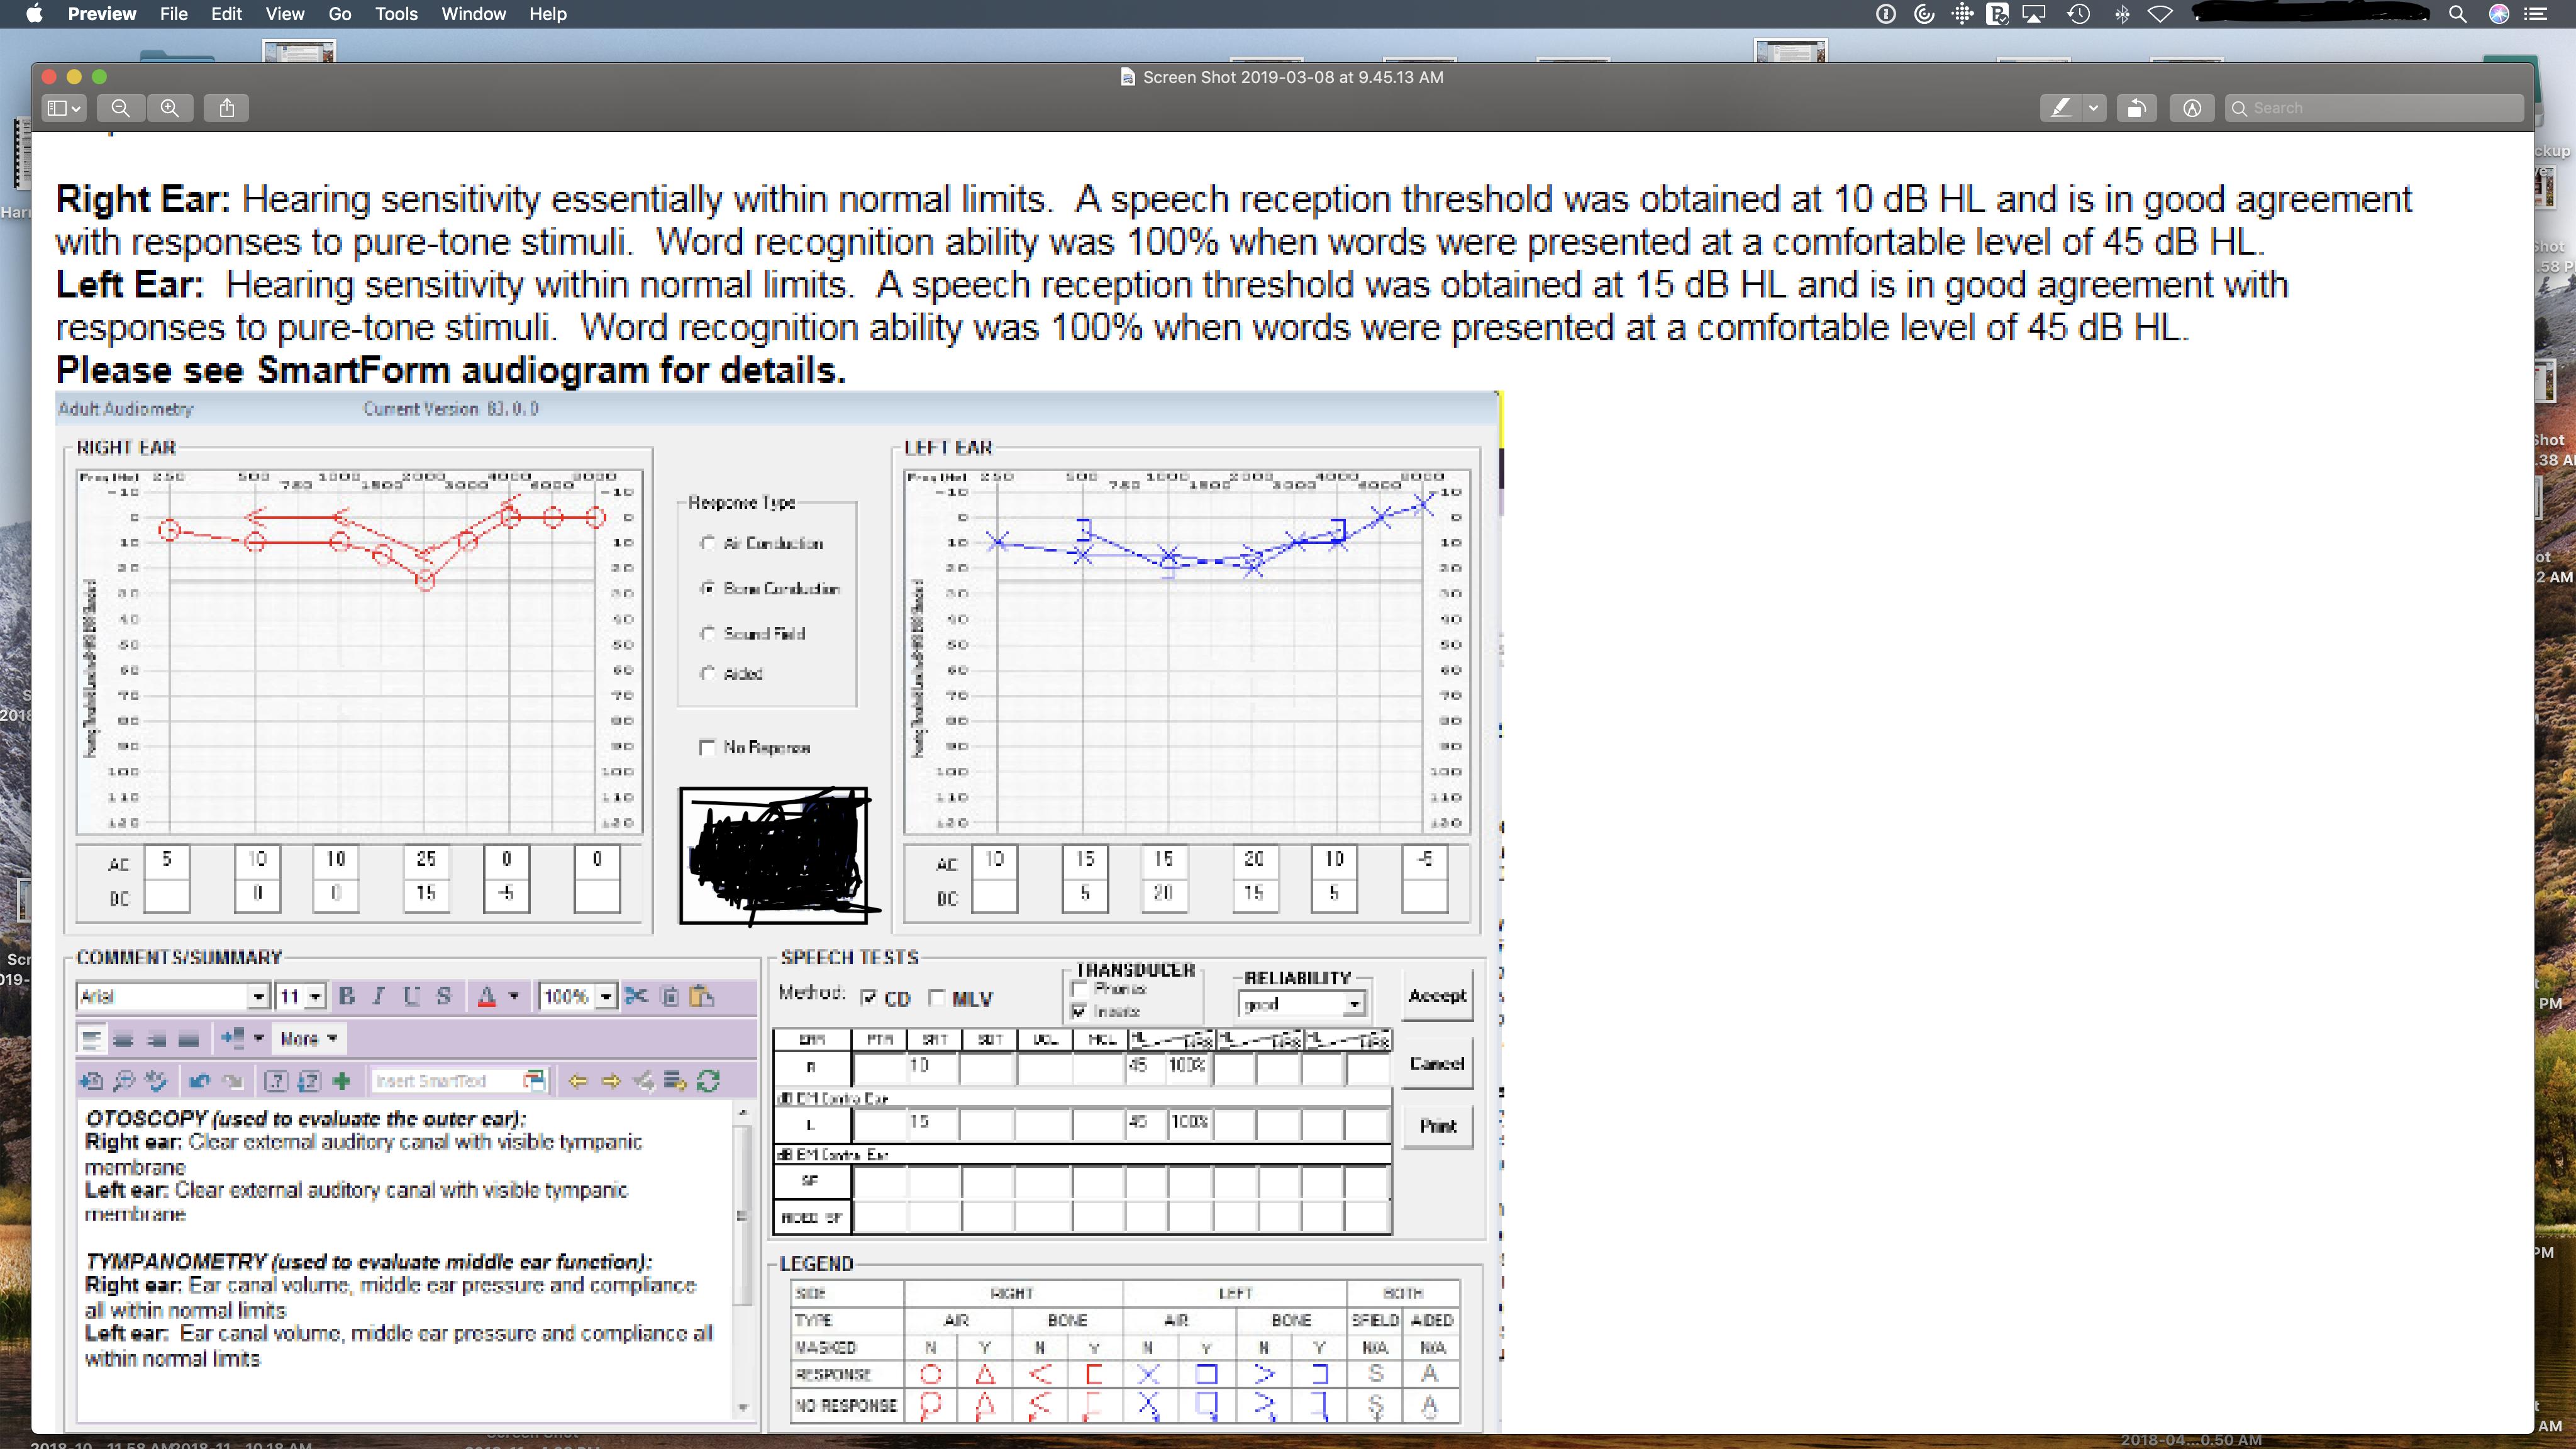 audiogram.png